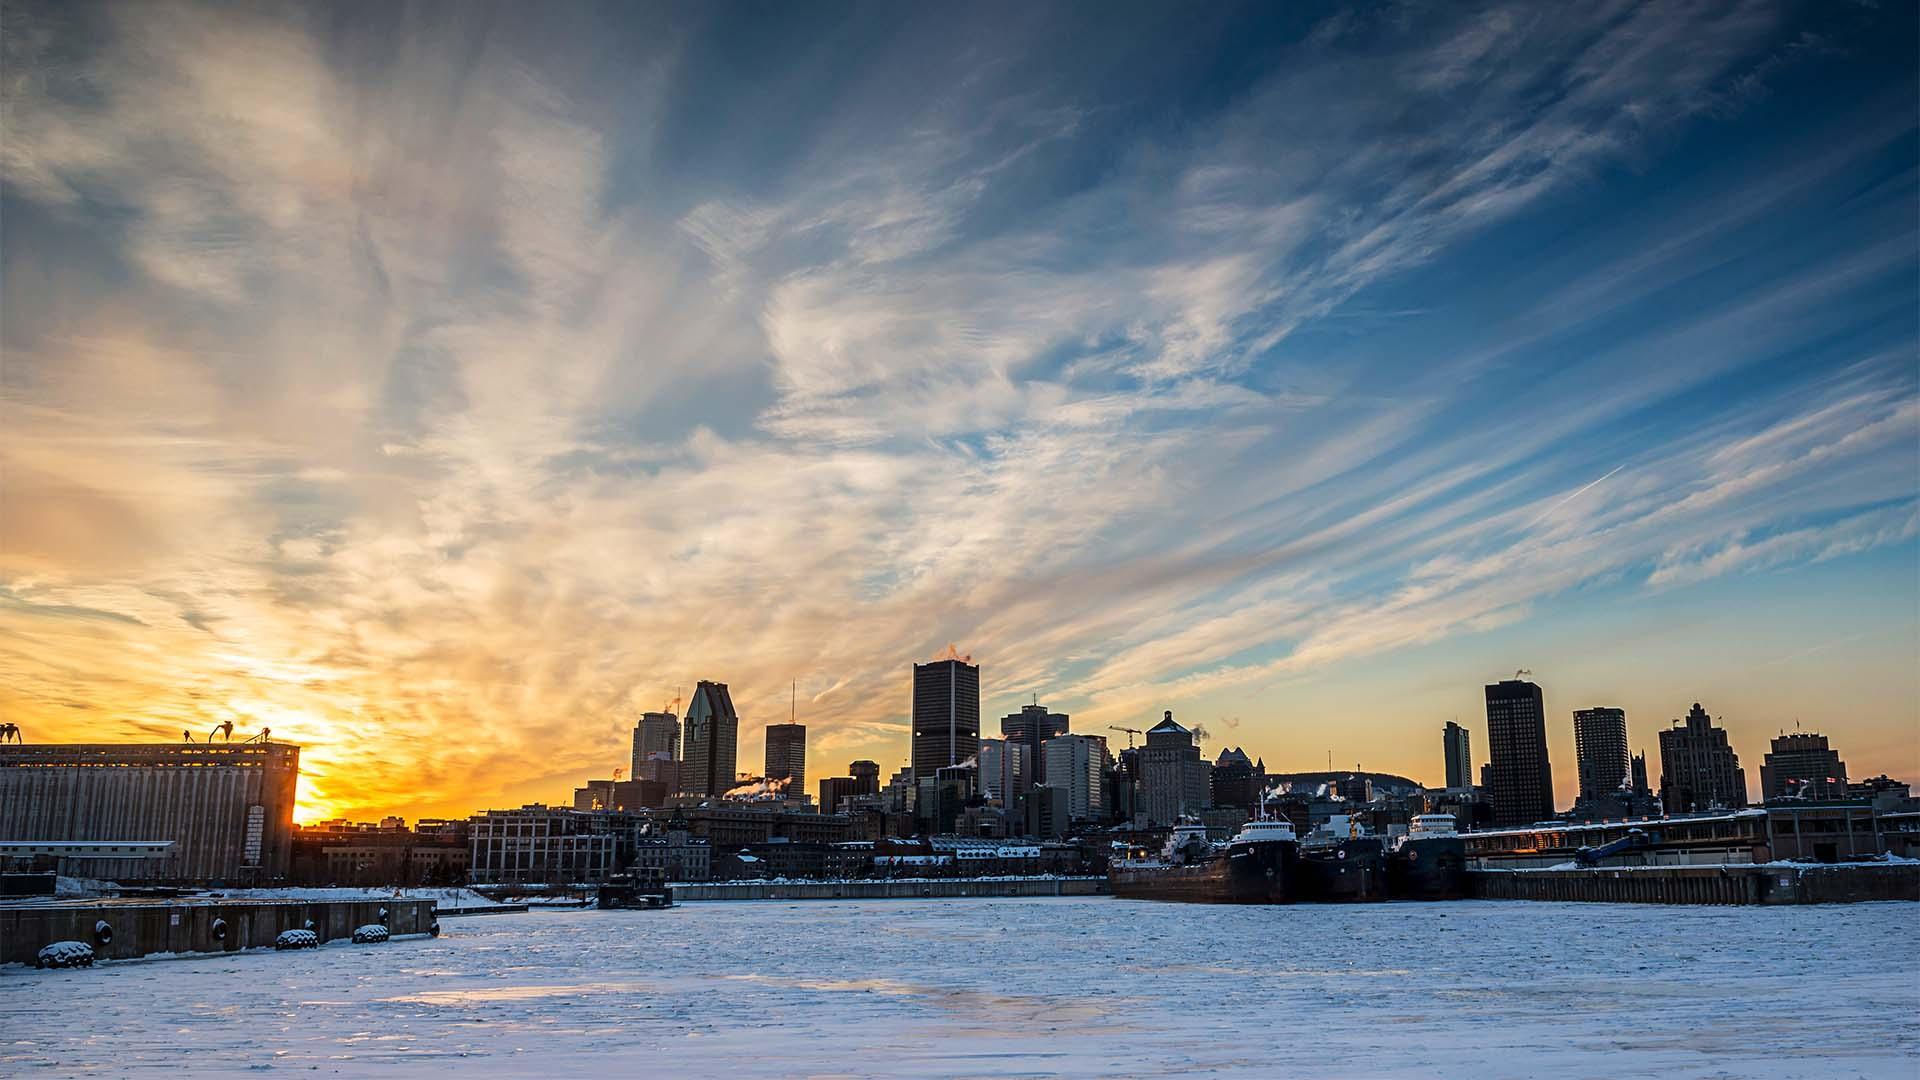 Quebec travel guide: the city